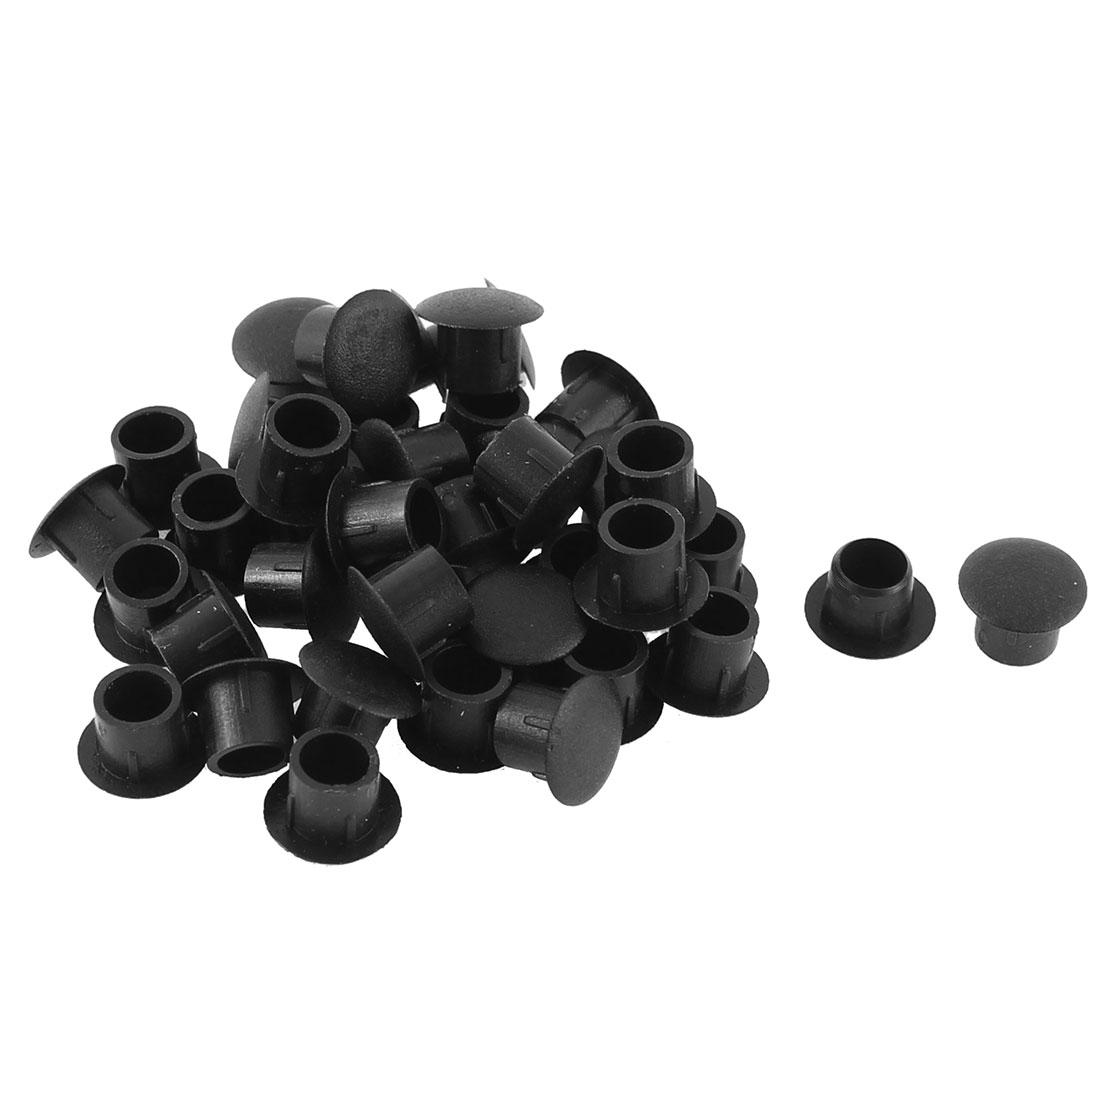 Home Kitchen Plastic Drawer Cabinet Decor CoverTube Insert Black 8mm Dia 40pcs